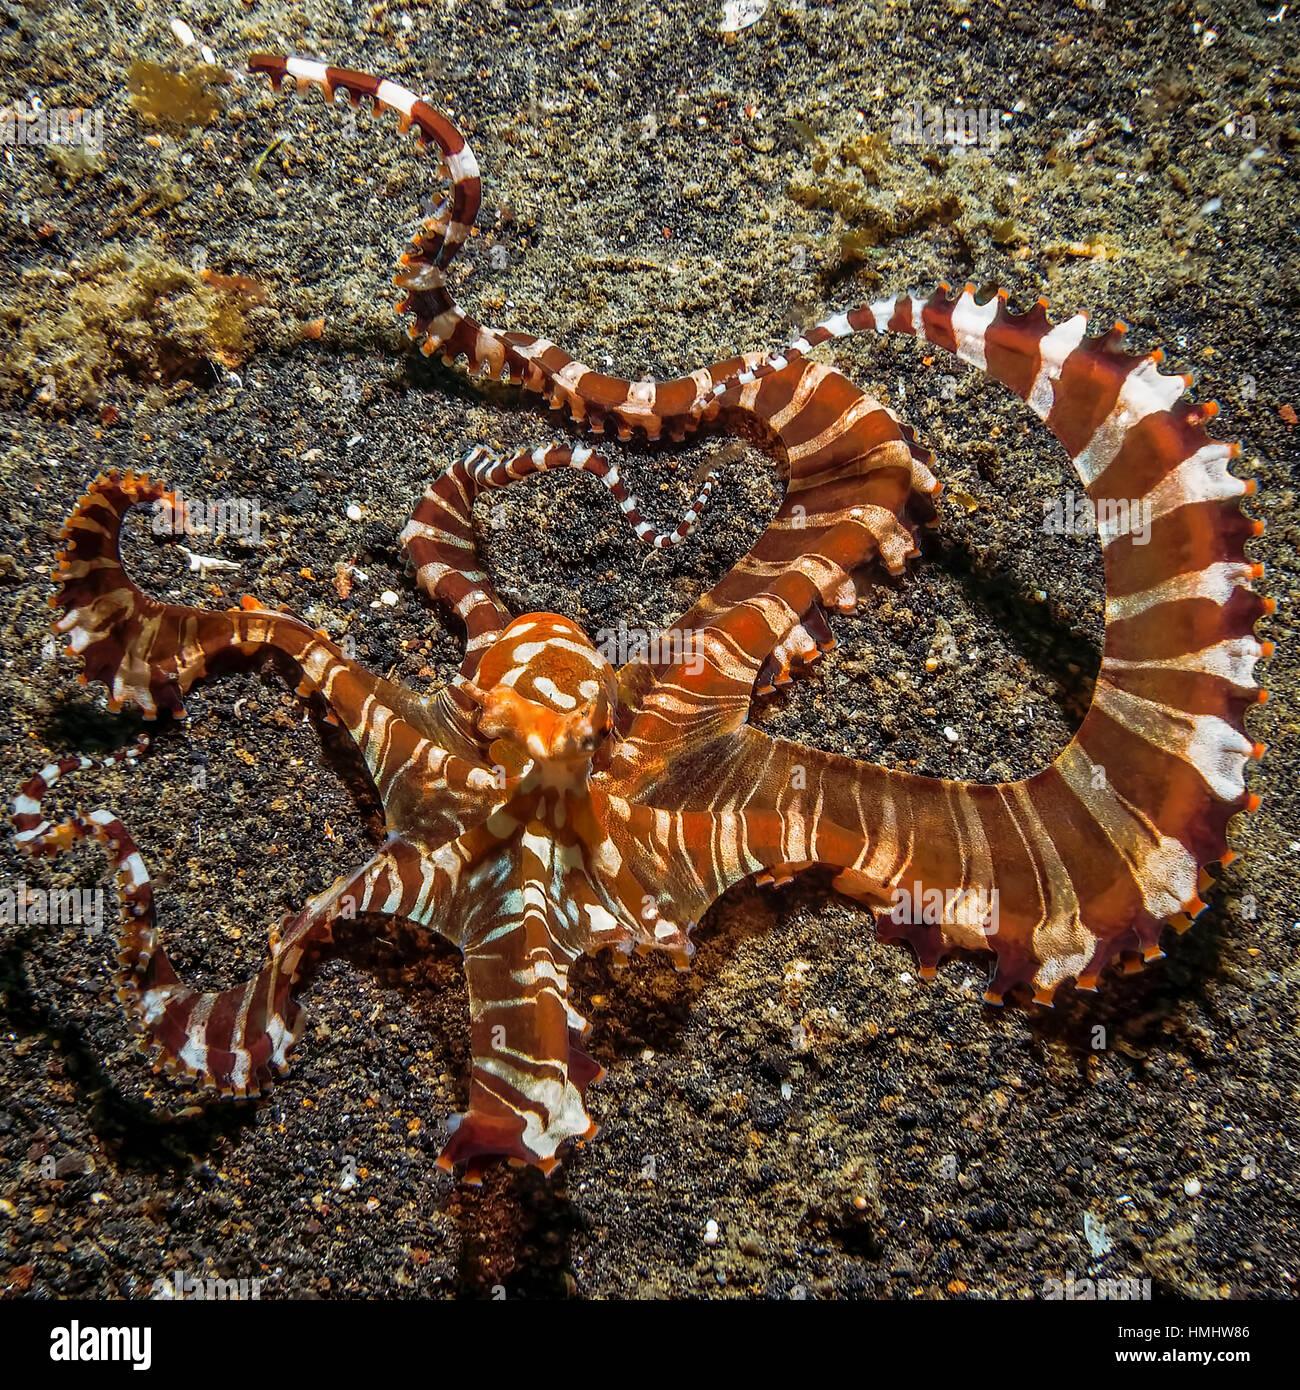 mimic octopus on the ocean floor - Stock Image